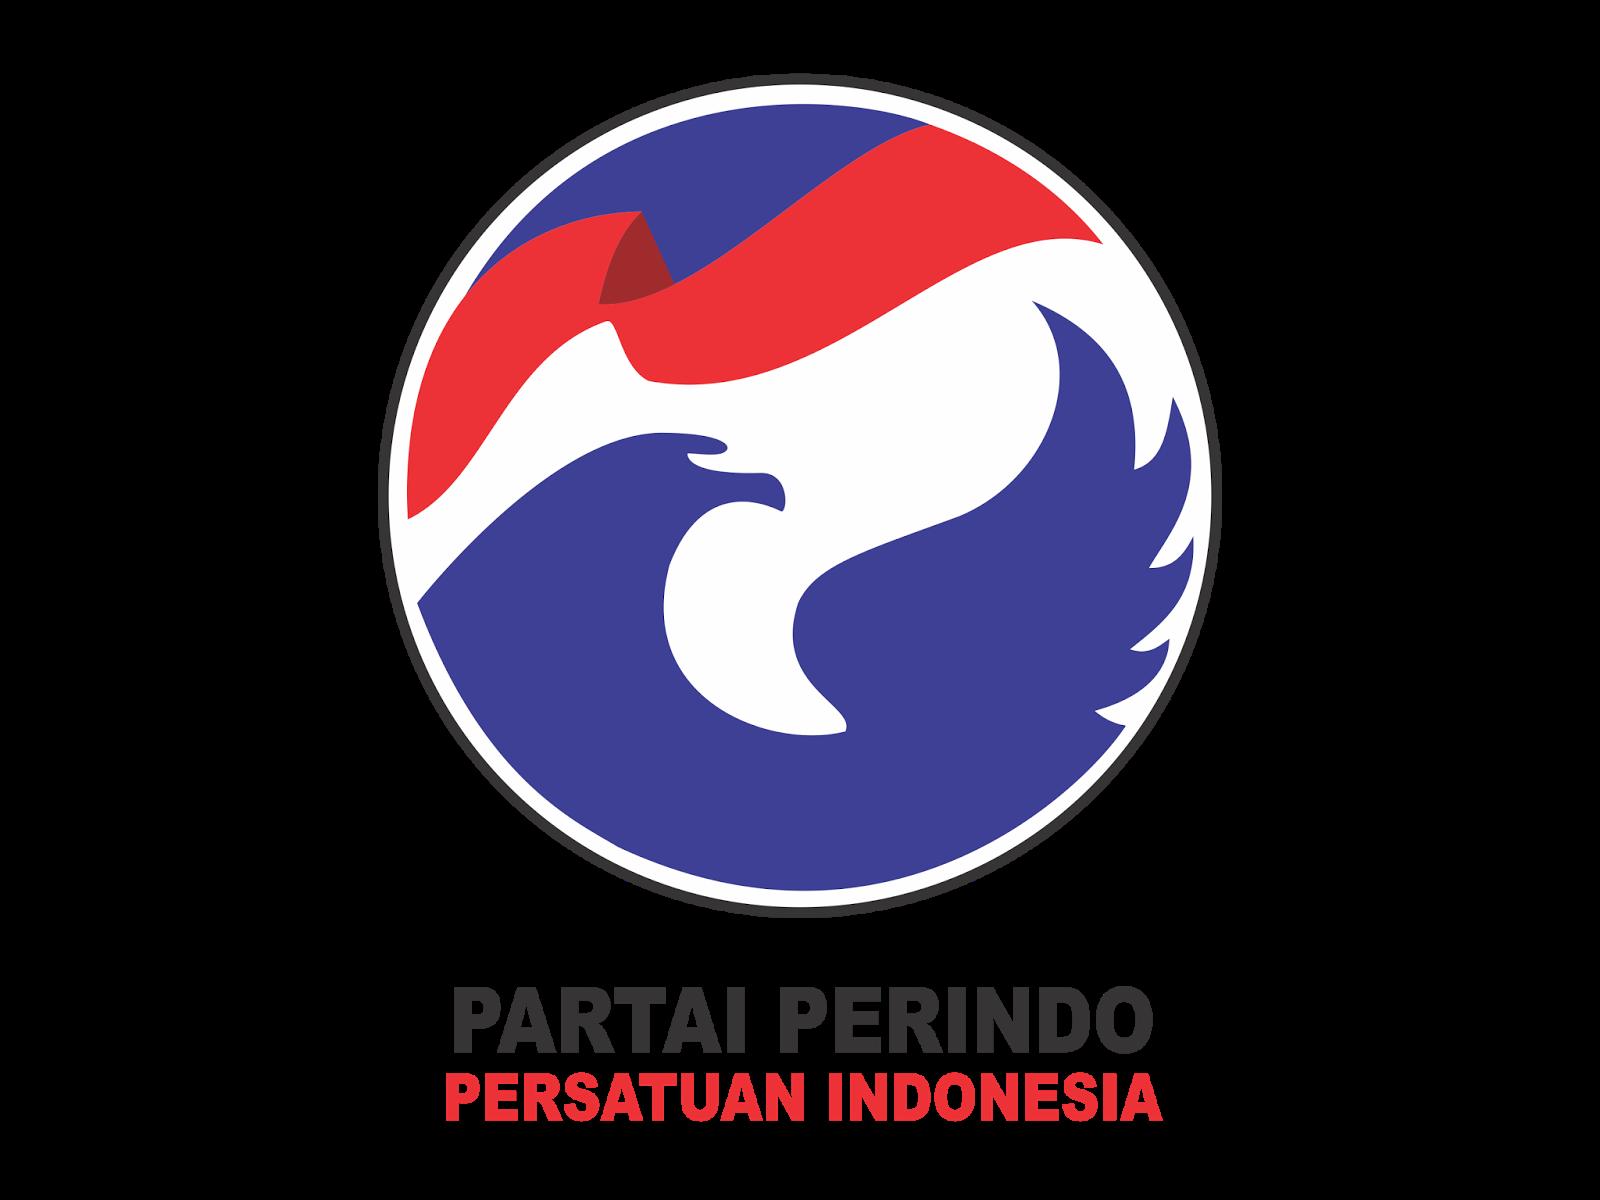 Hasil gambar untuk perindo logo